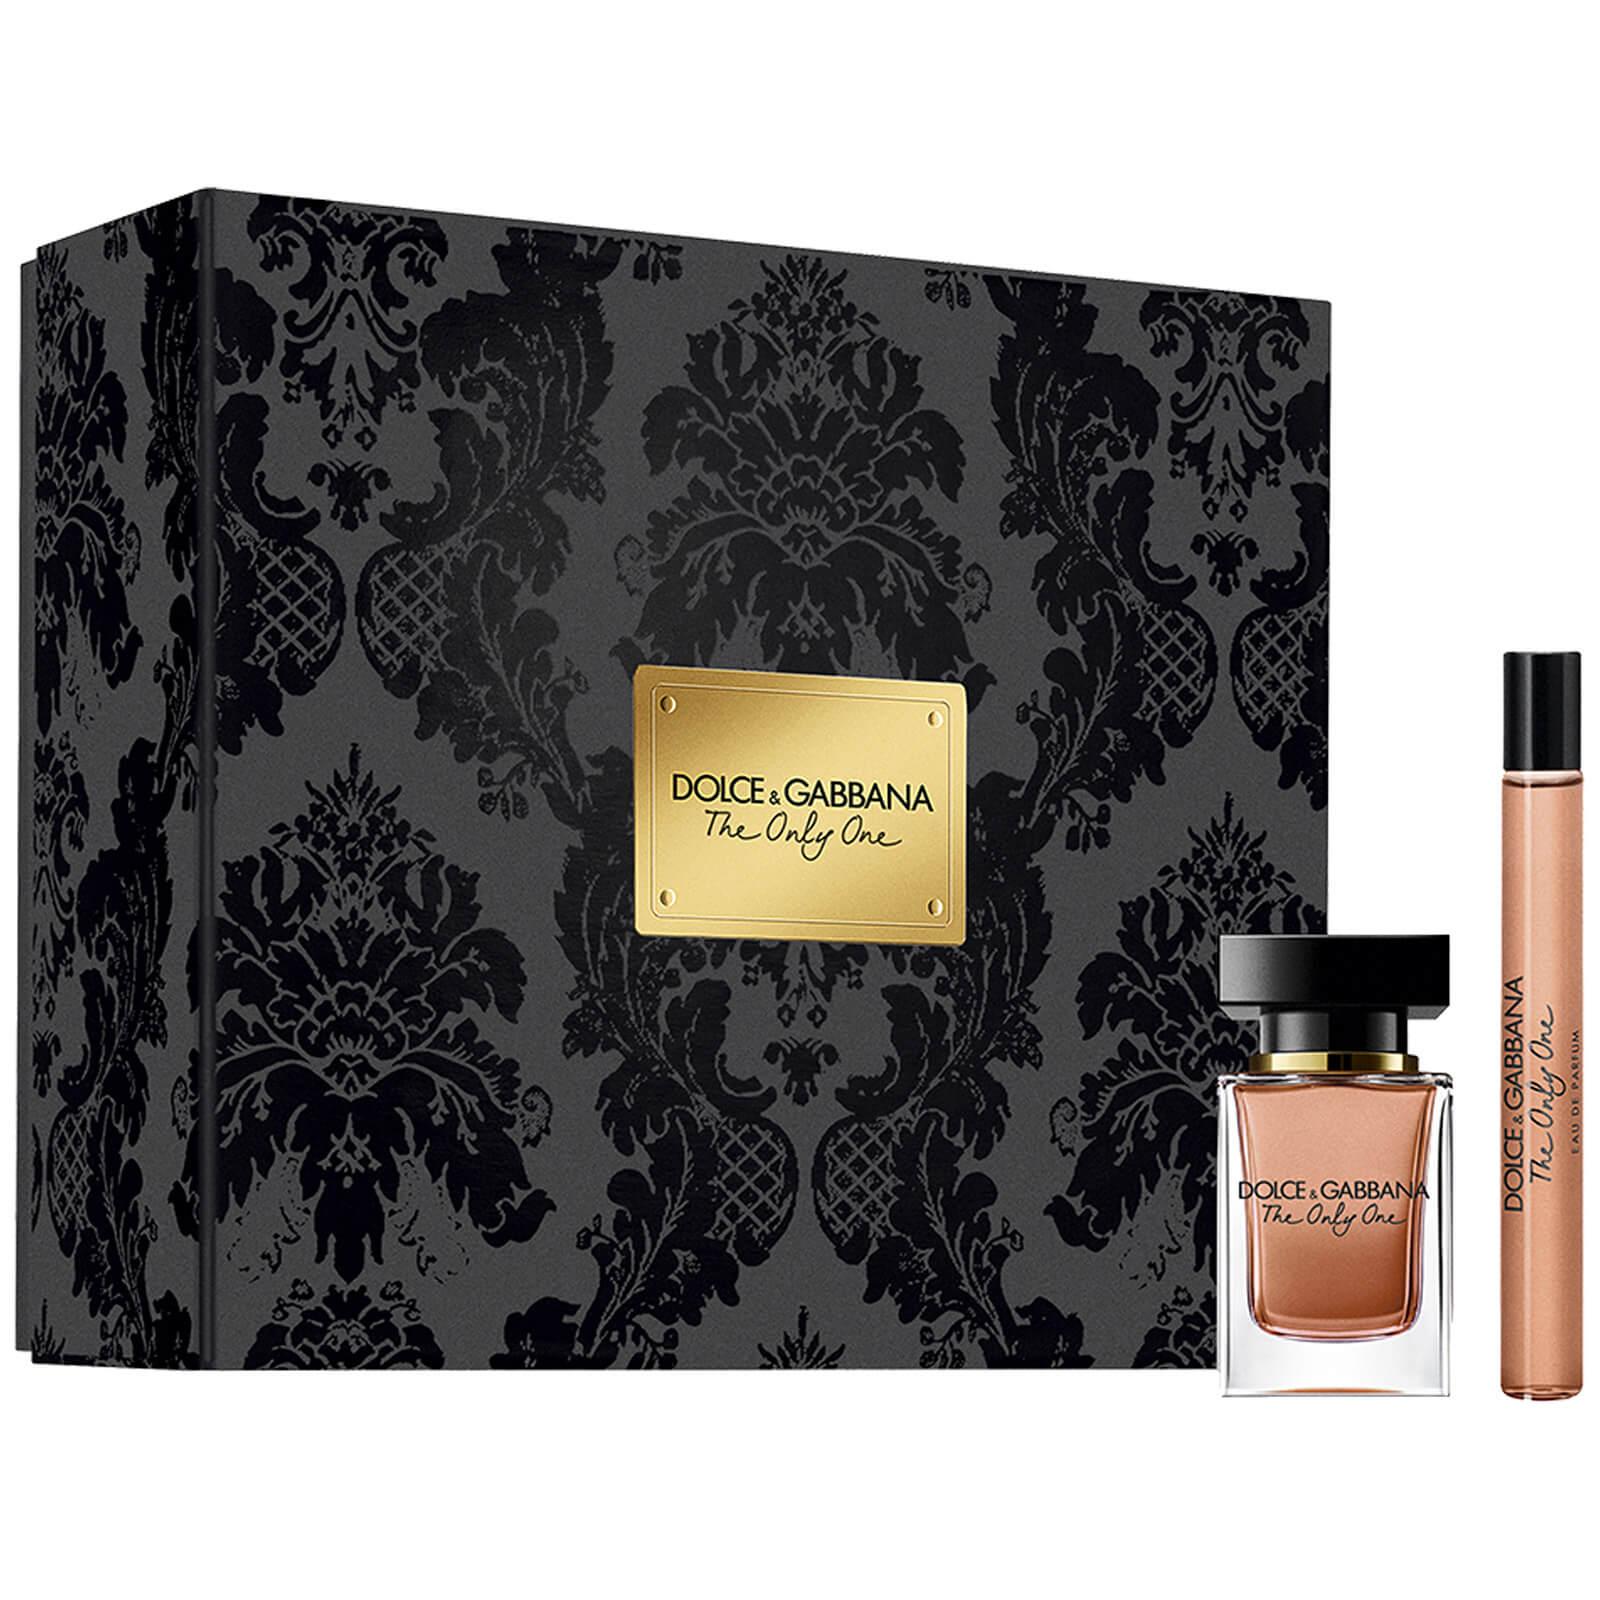 Dolce & Gabbana - The Only One EDP 30 ml + Travel Spray 10 ml - Giftset